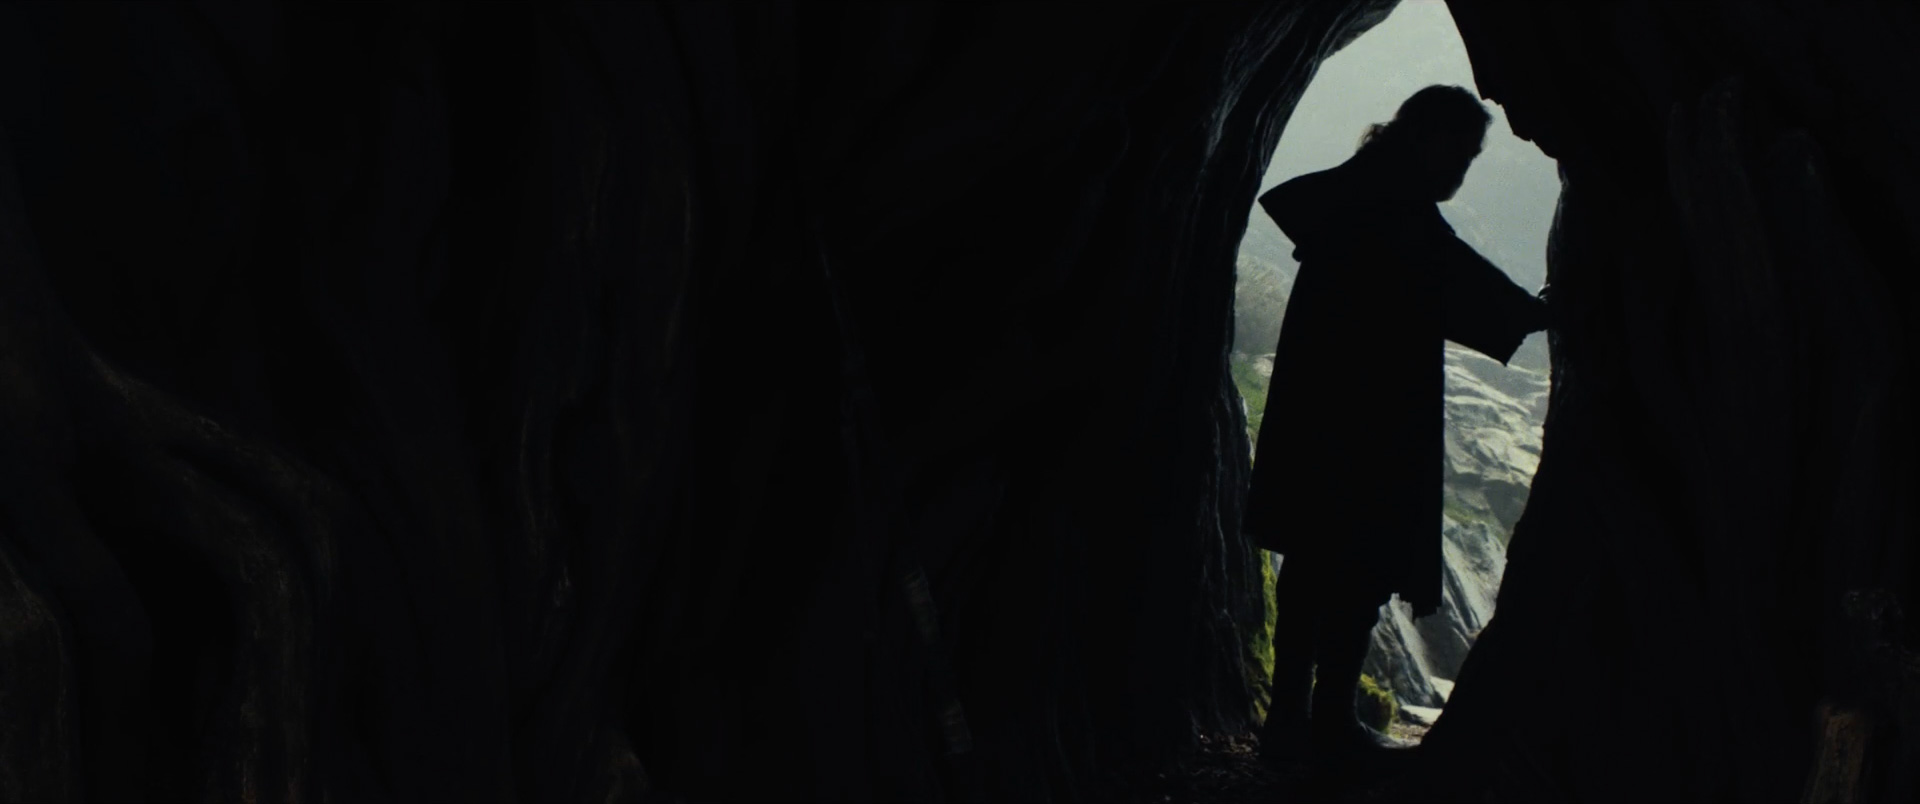 Star Wars: The Last Jedi Official Teaser Trailer